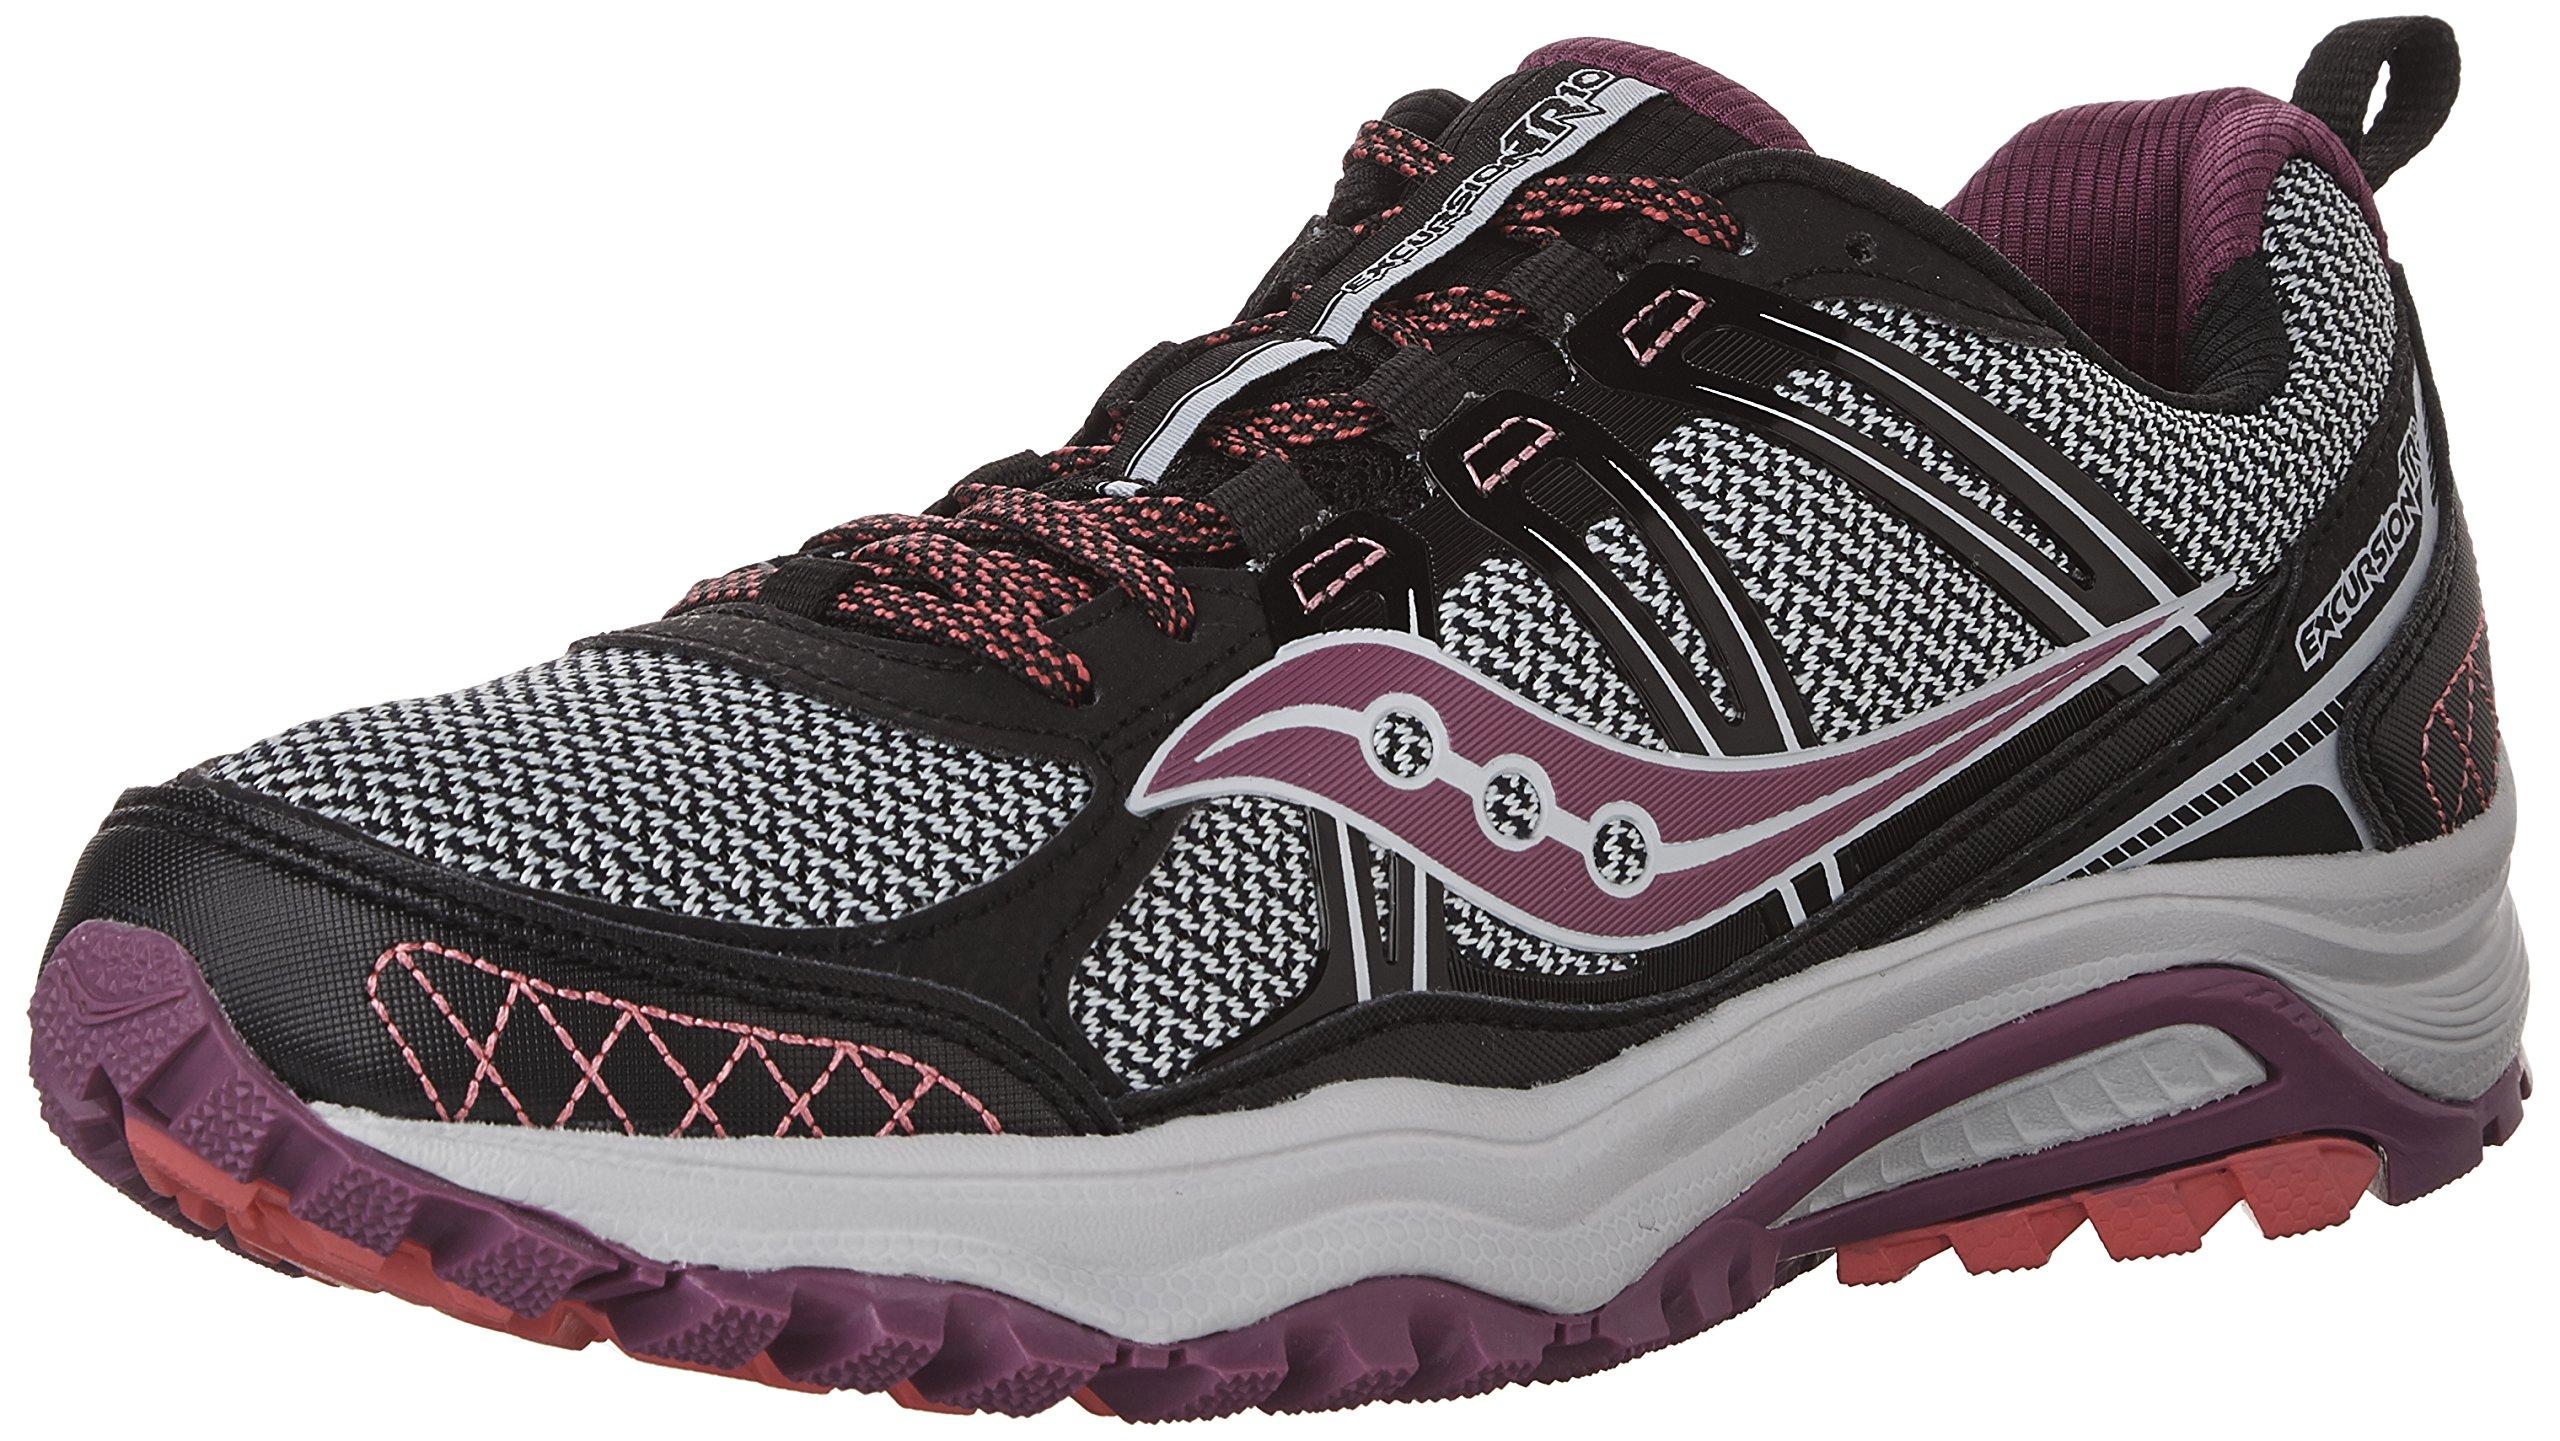 Saucony Running Shoes Excursion Tr10 Black/Berry/Coral 40m: Amazon.es: Deportes y aire libre